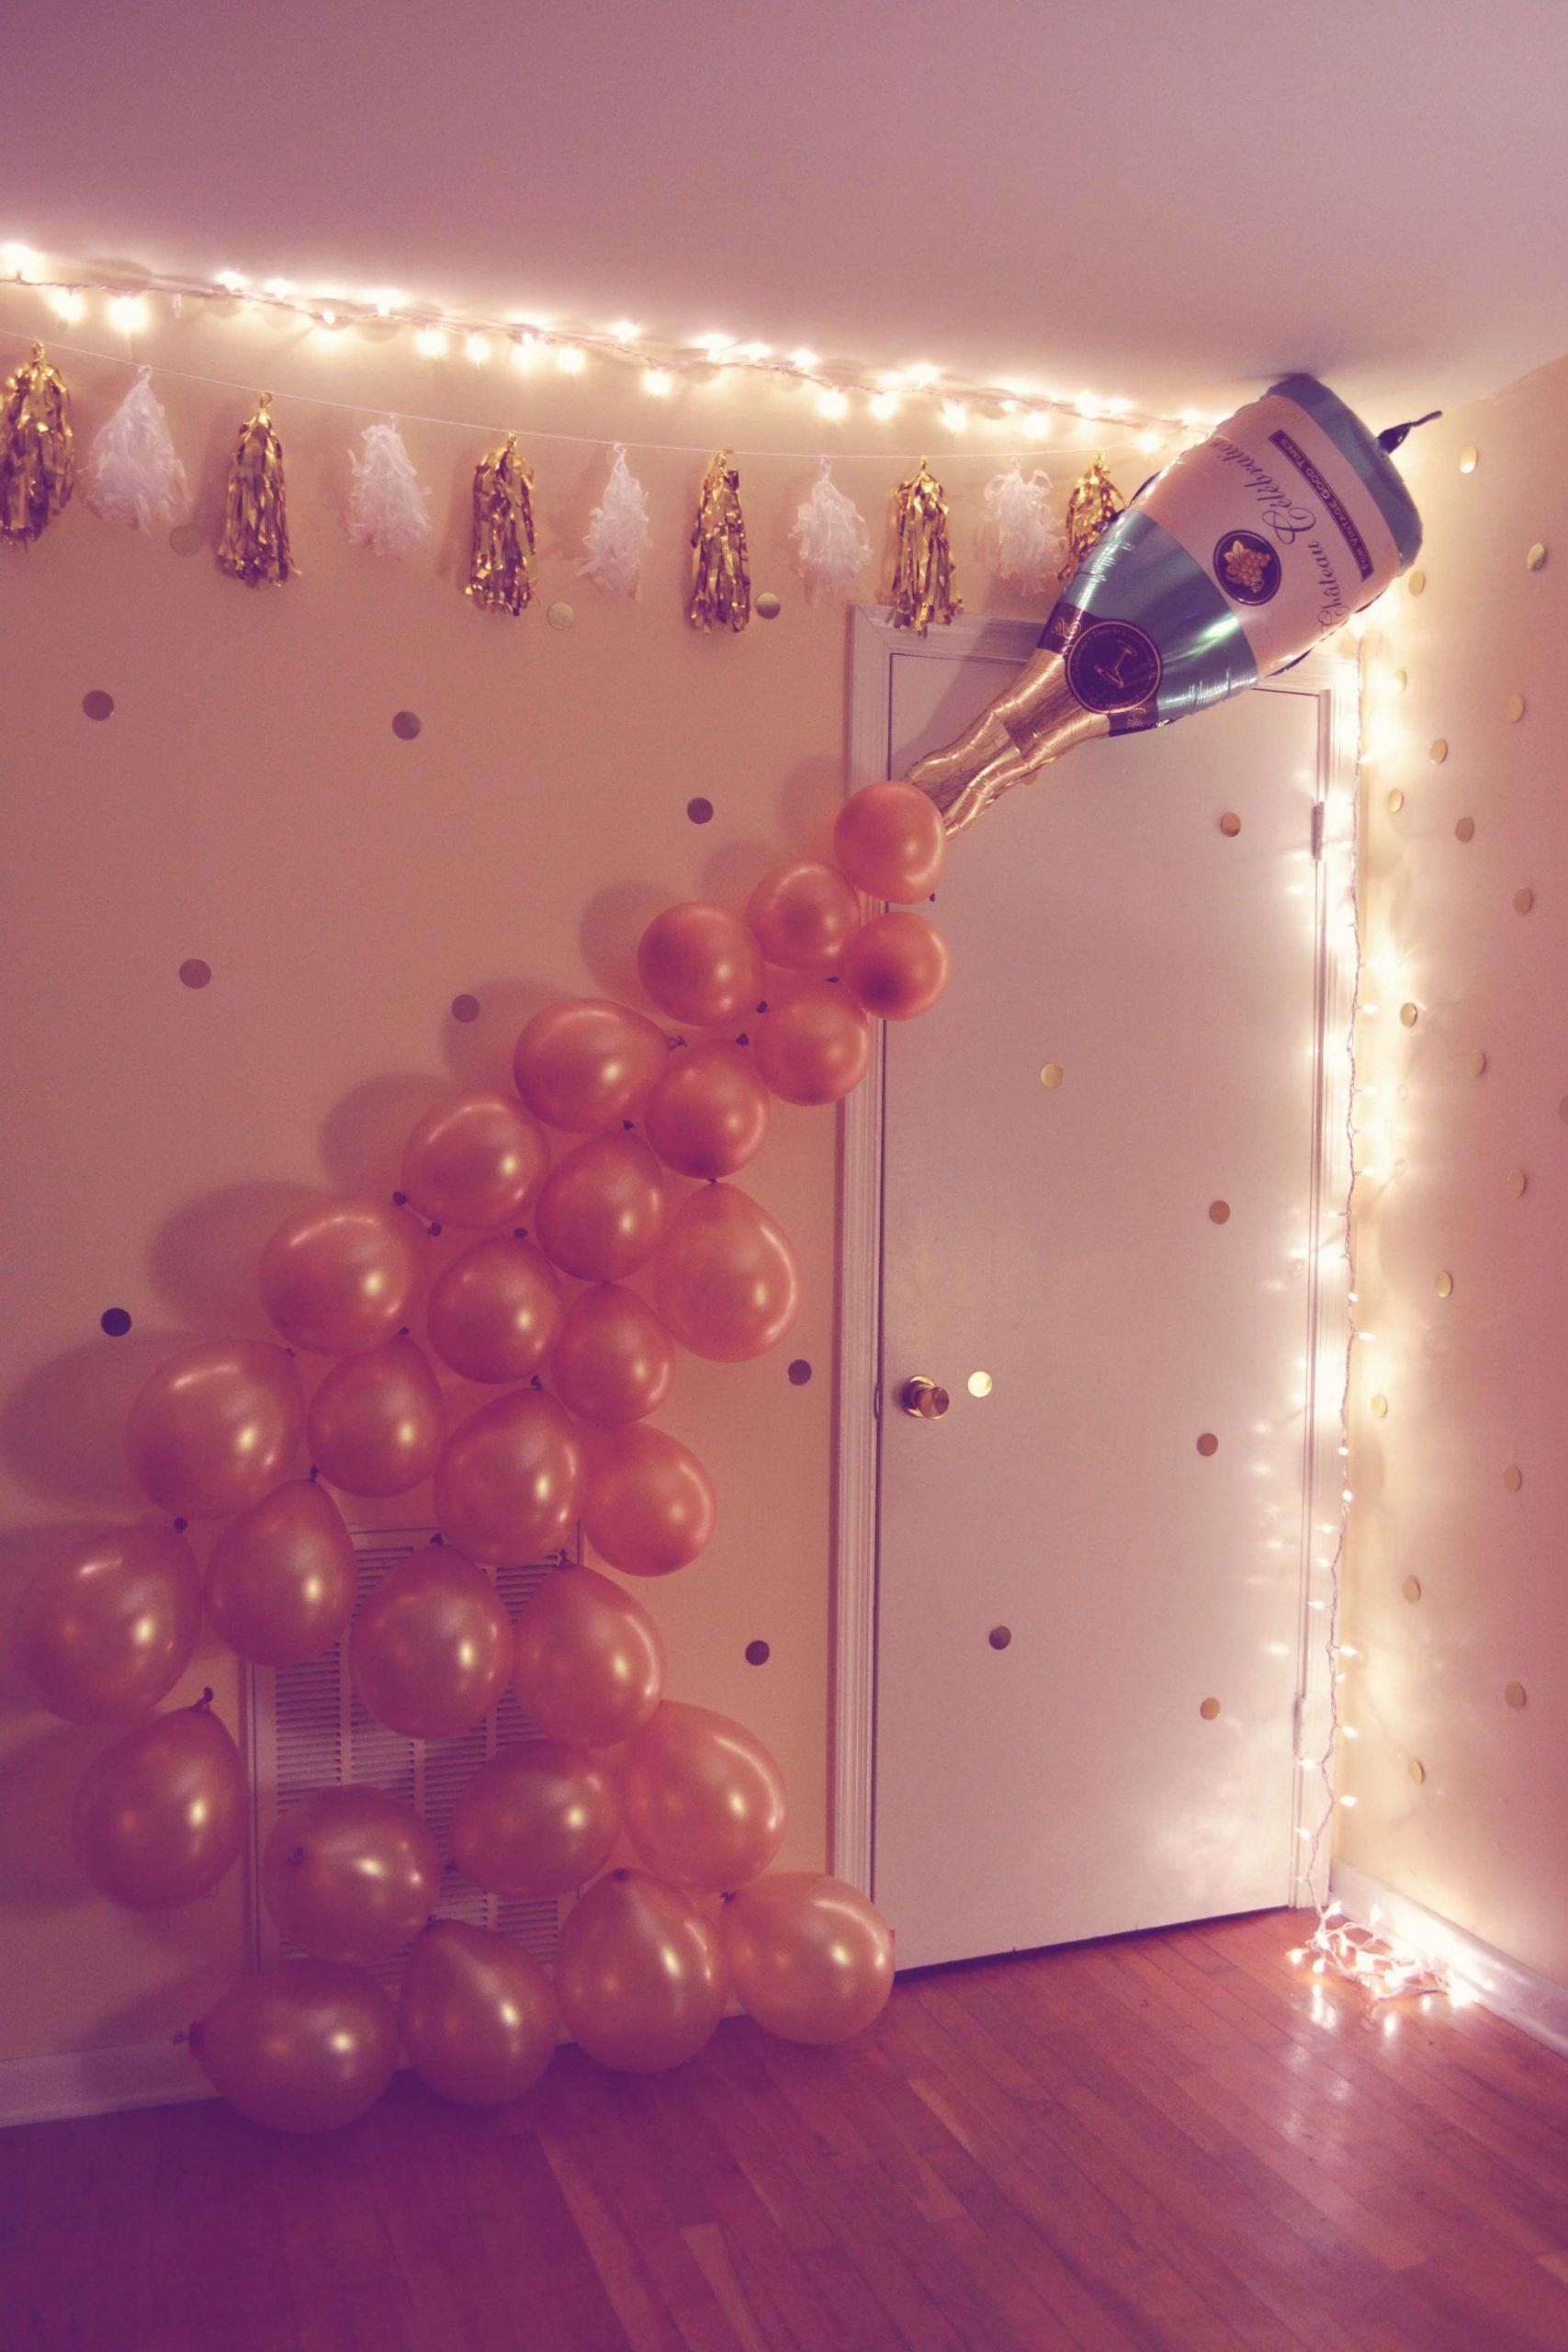 21st Birthday Decorations  DIY 21st Birthday Party – Just a Virginia girl